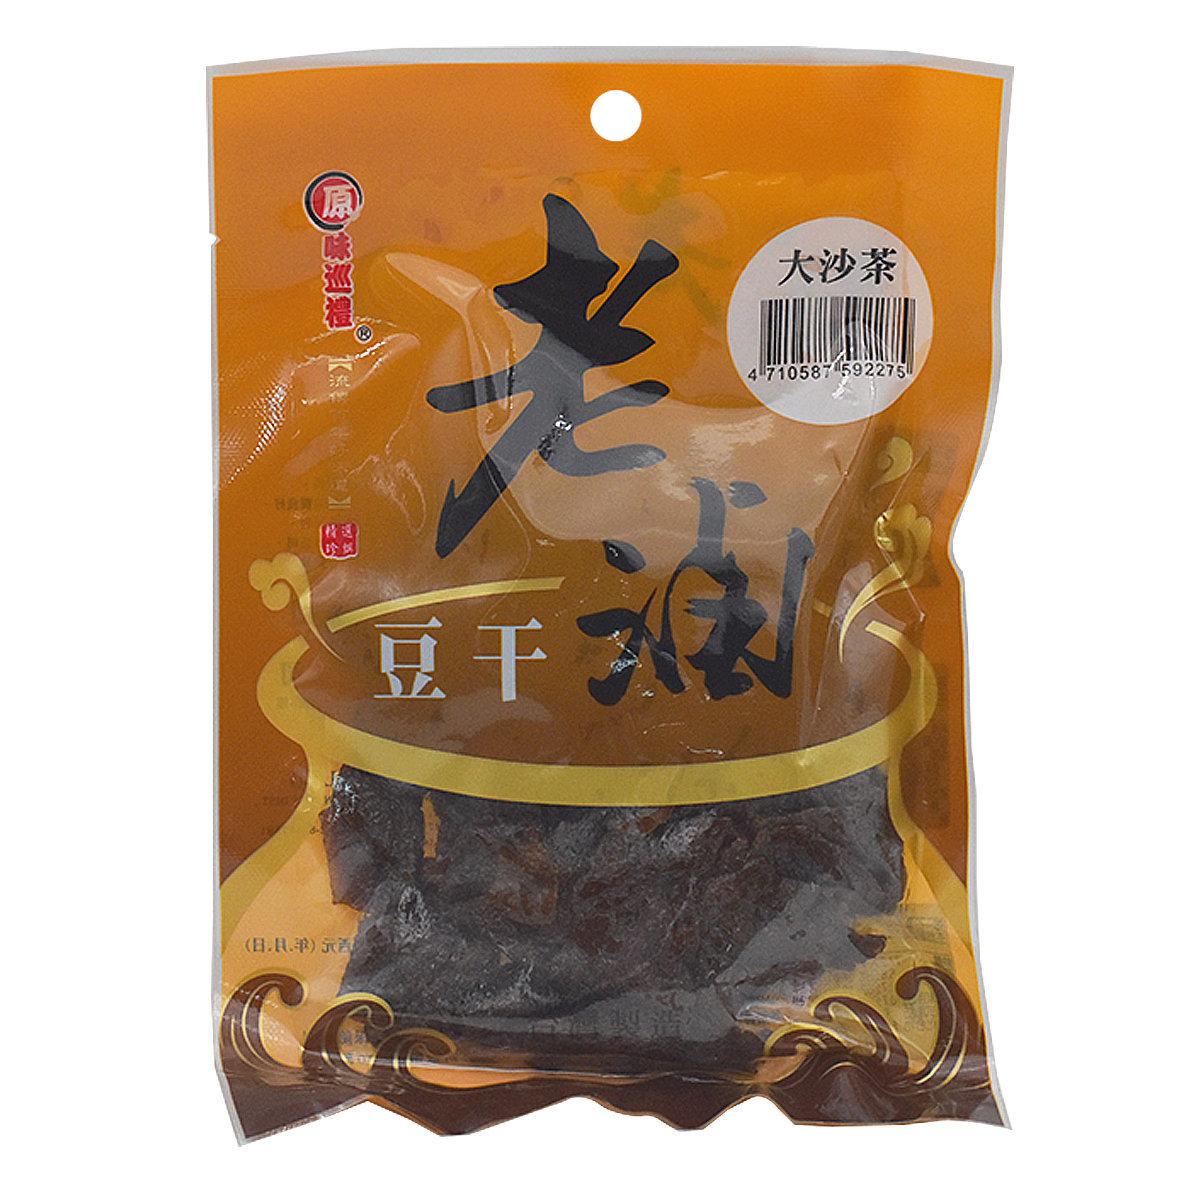 Big Sand Tea Dried Beans